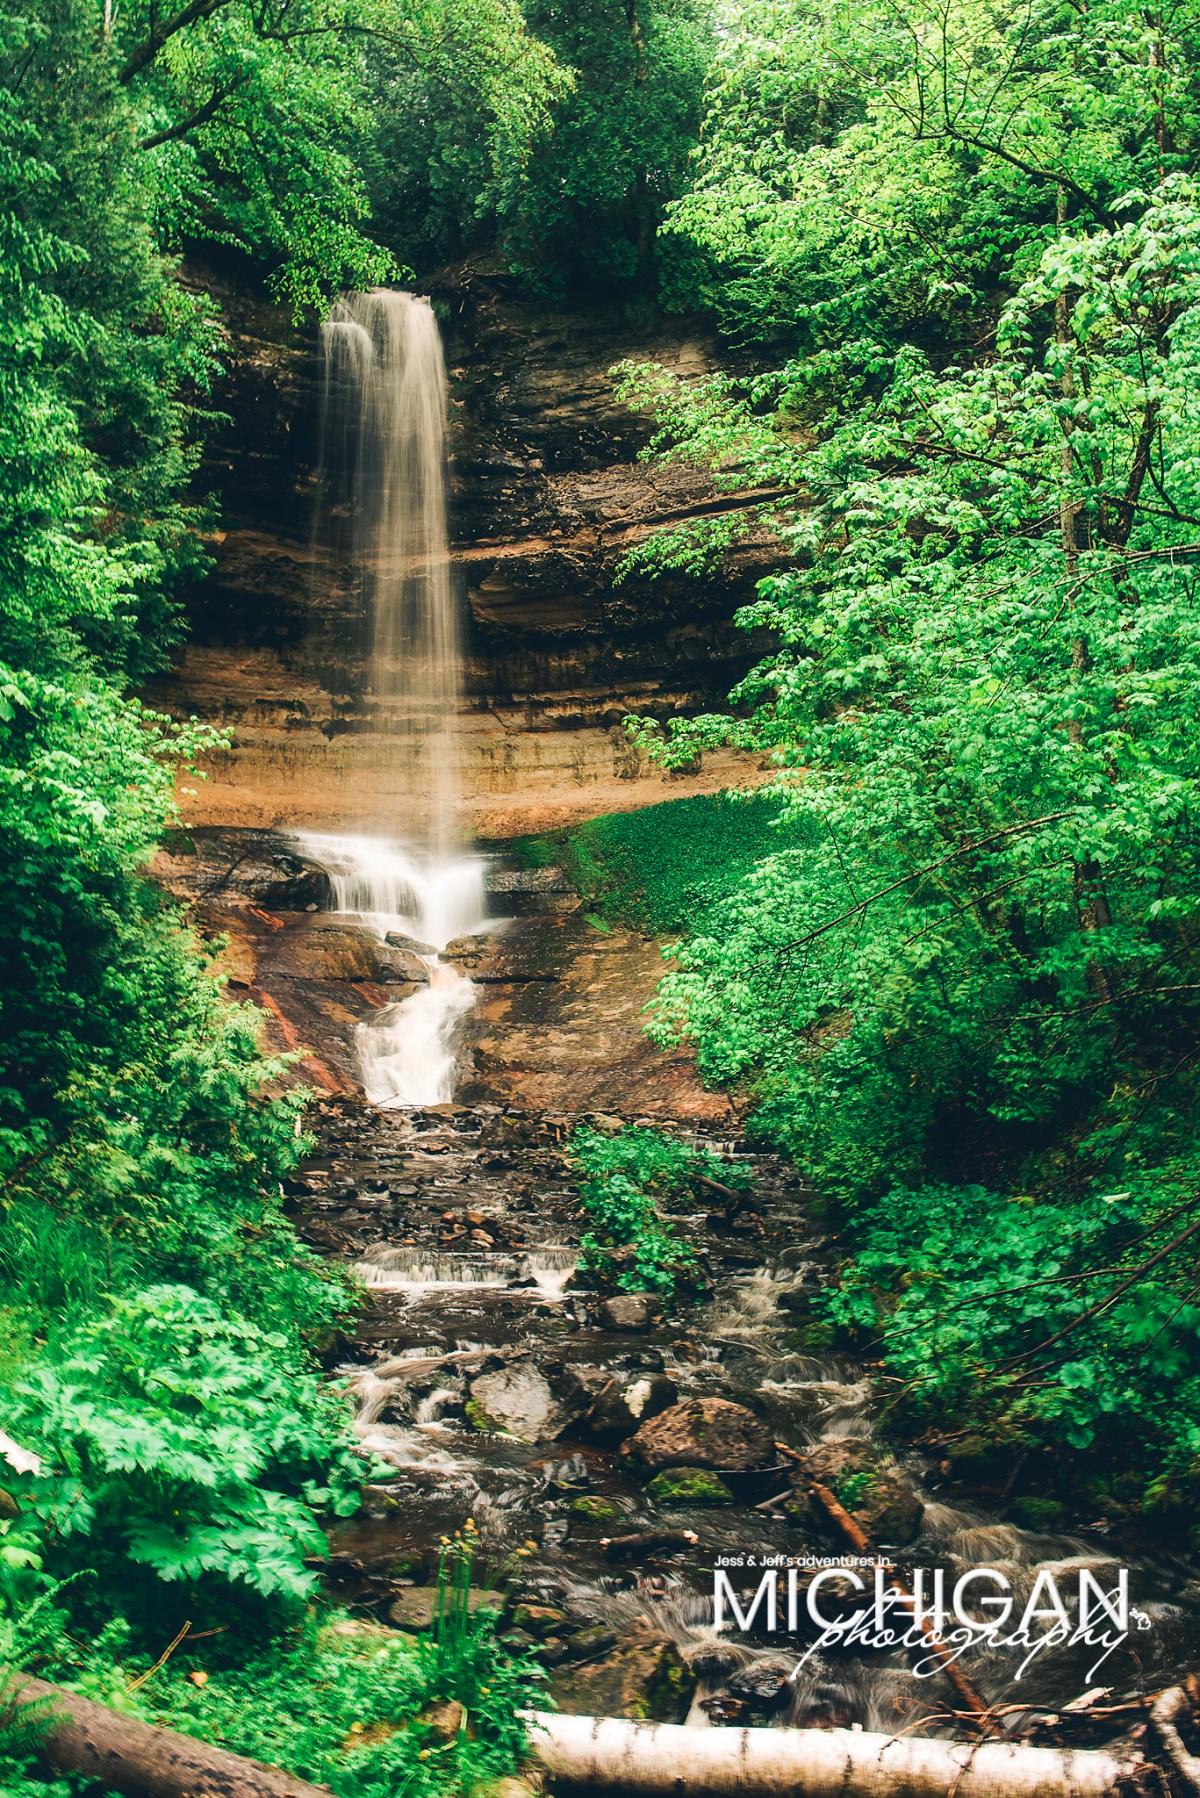 Munising Falls in Michigan's Upper Peninsula